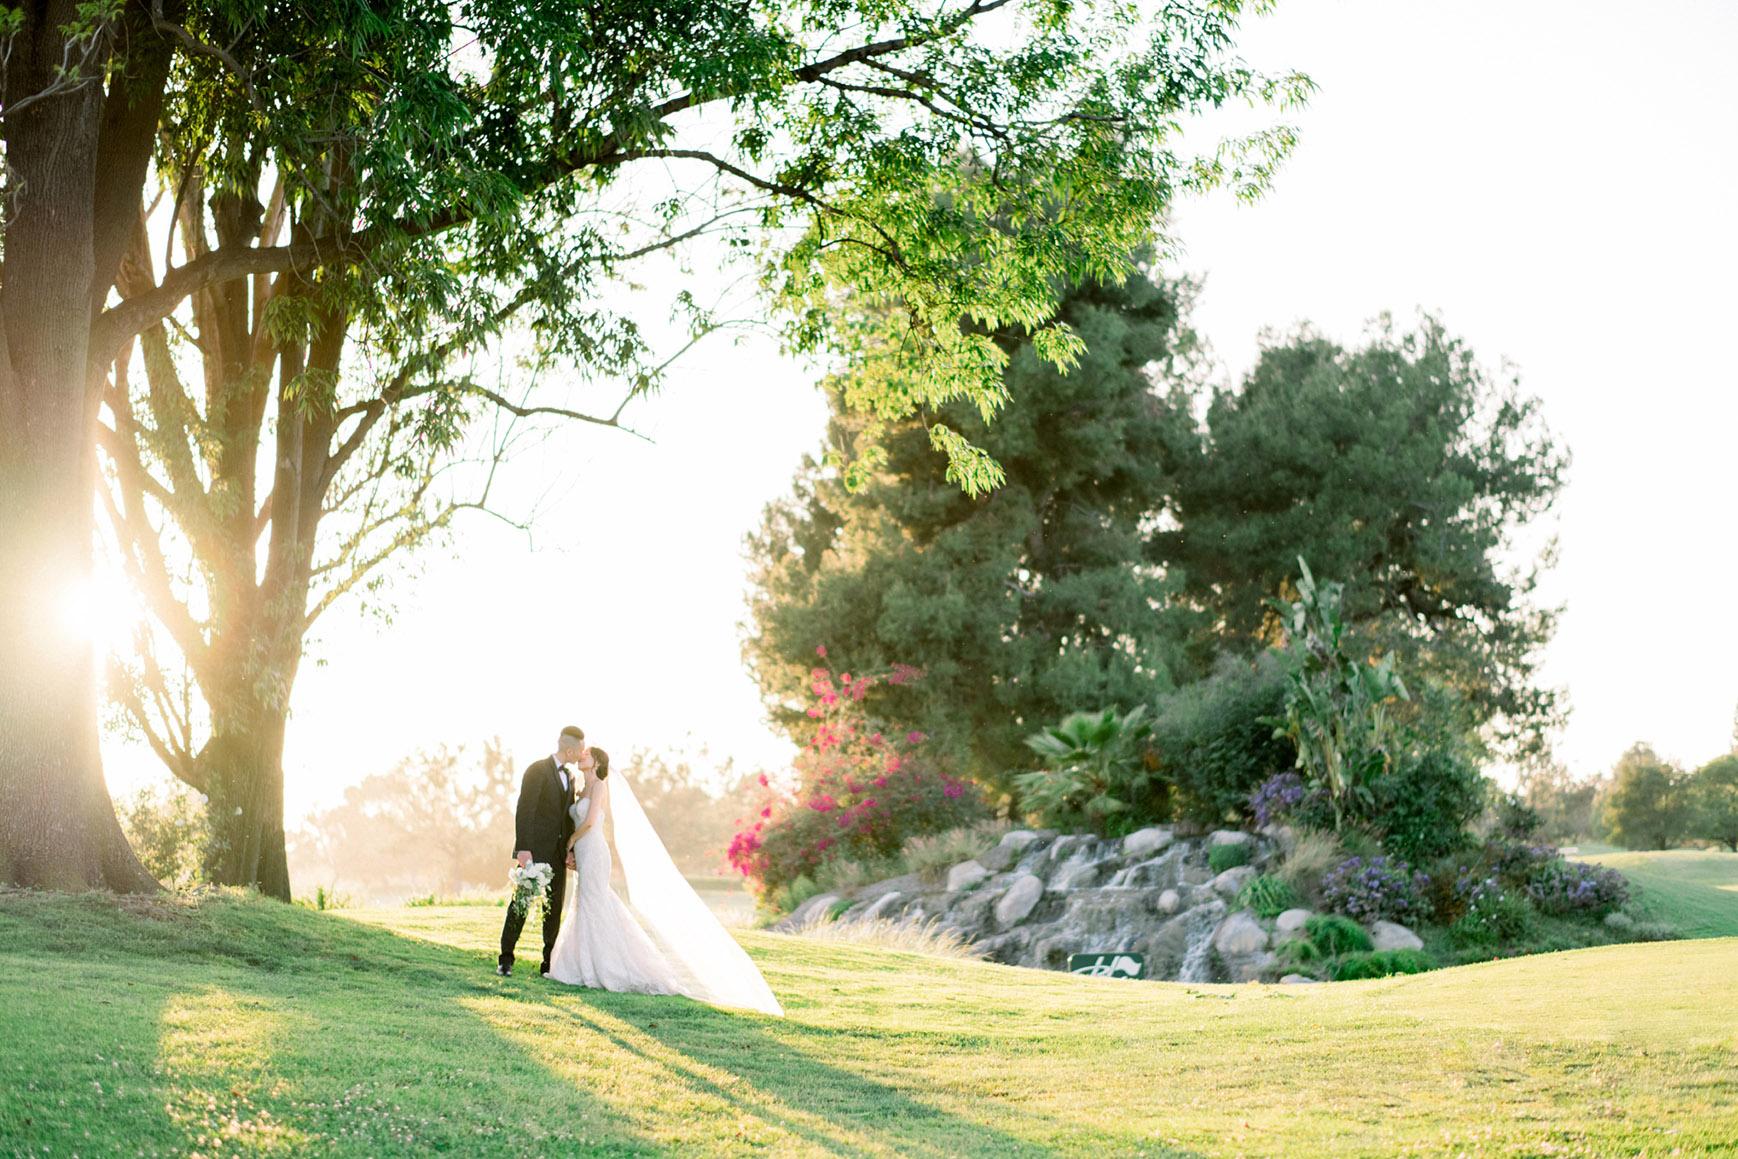 Happy couple - Rio Hondo - Downey, California - Los Angeles County - Wedgewood Weddings